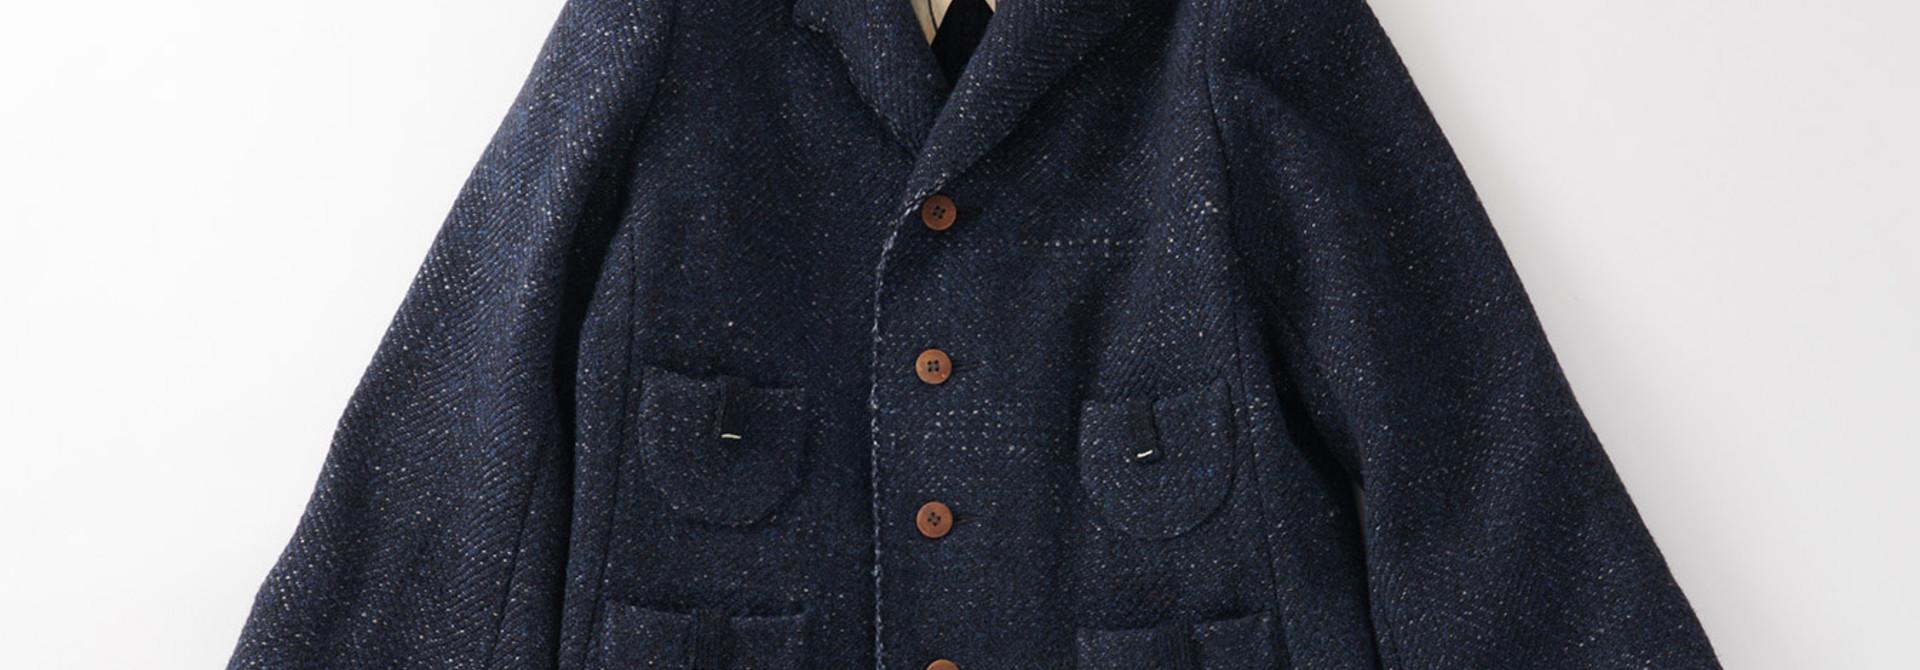 Mixed Tweed Knit Jacket